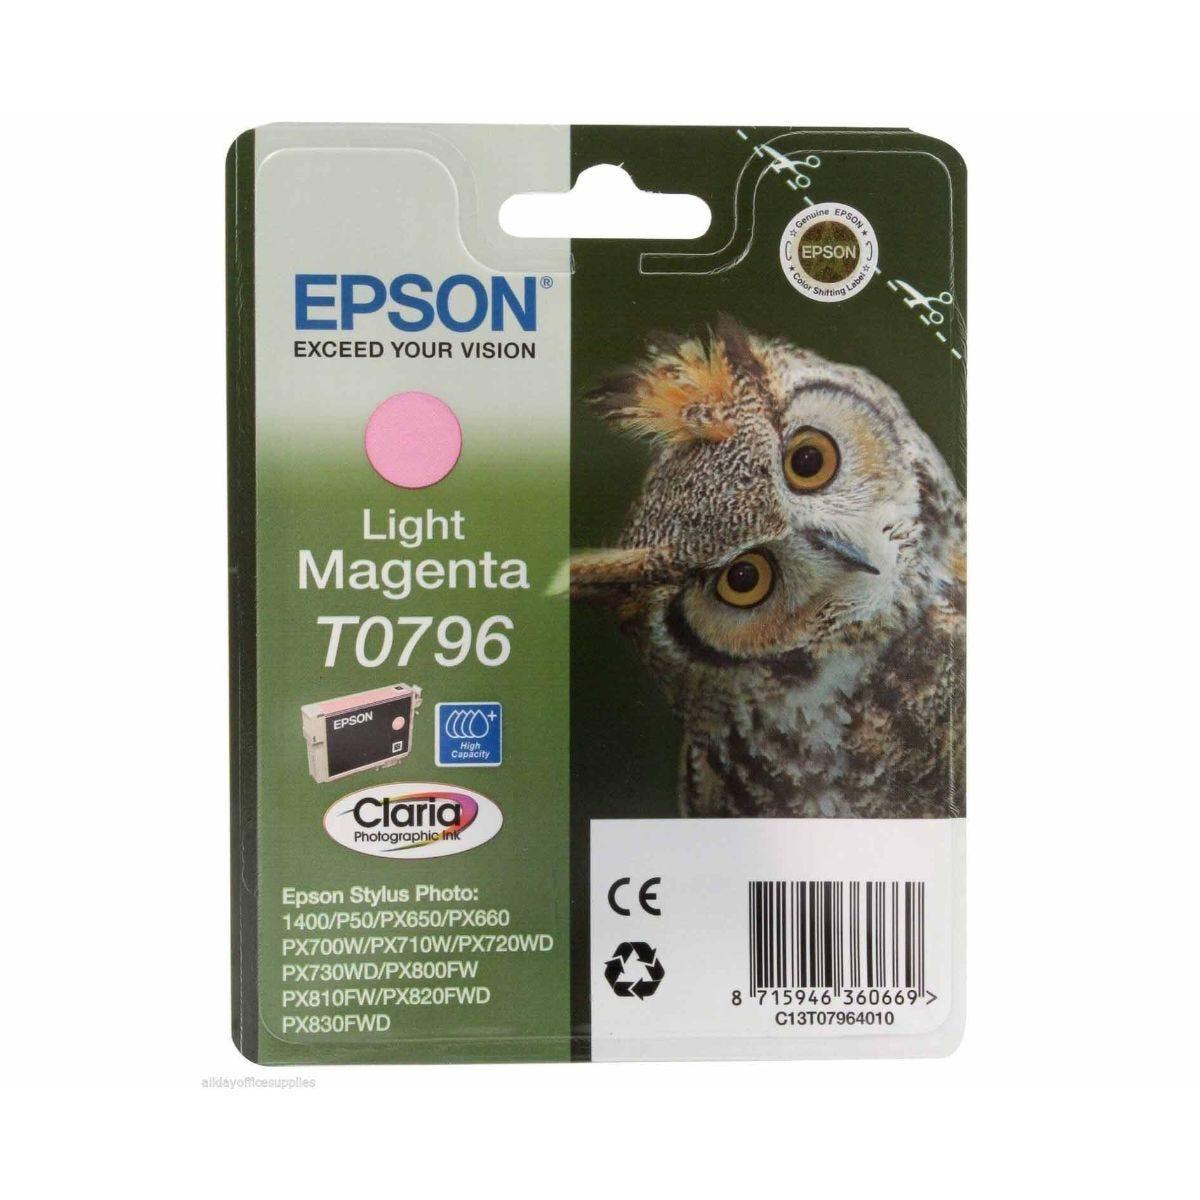 Epson T0796 Ink Cartridge